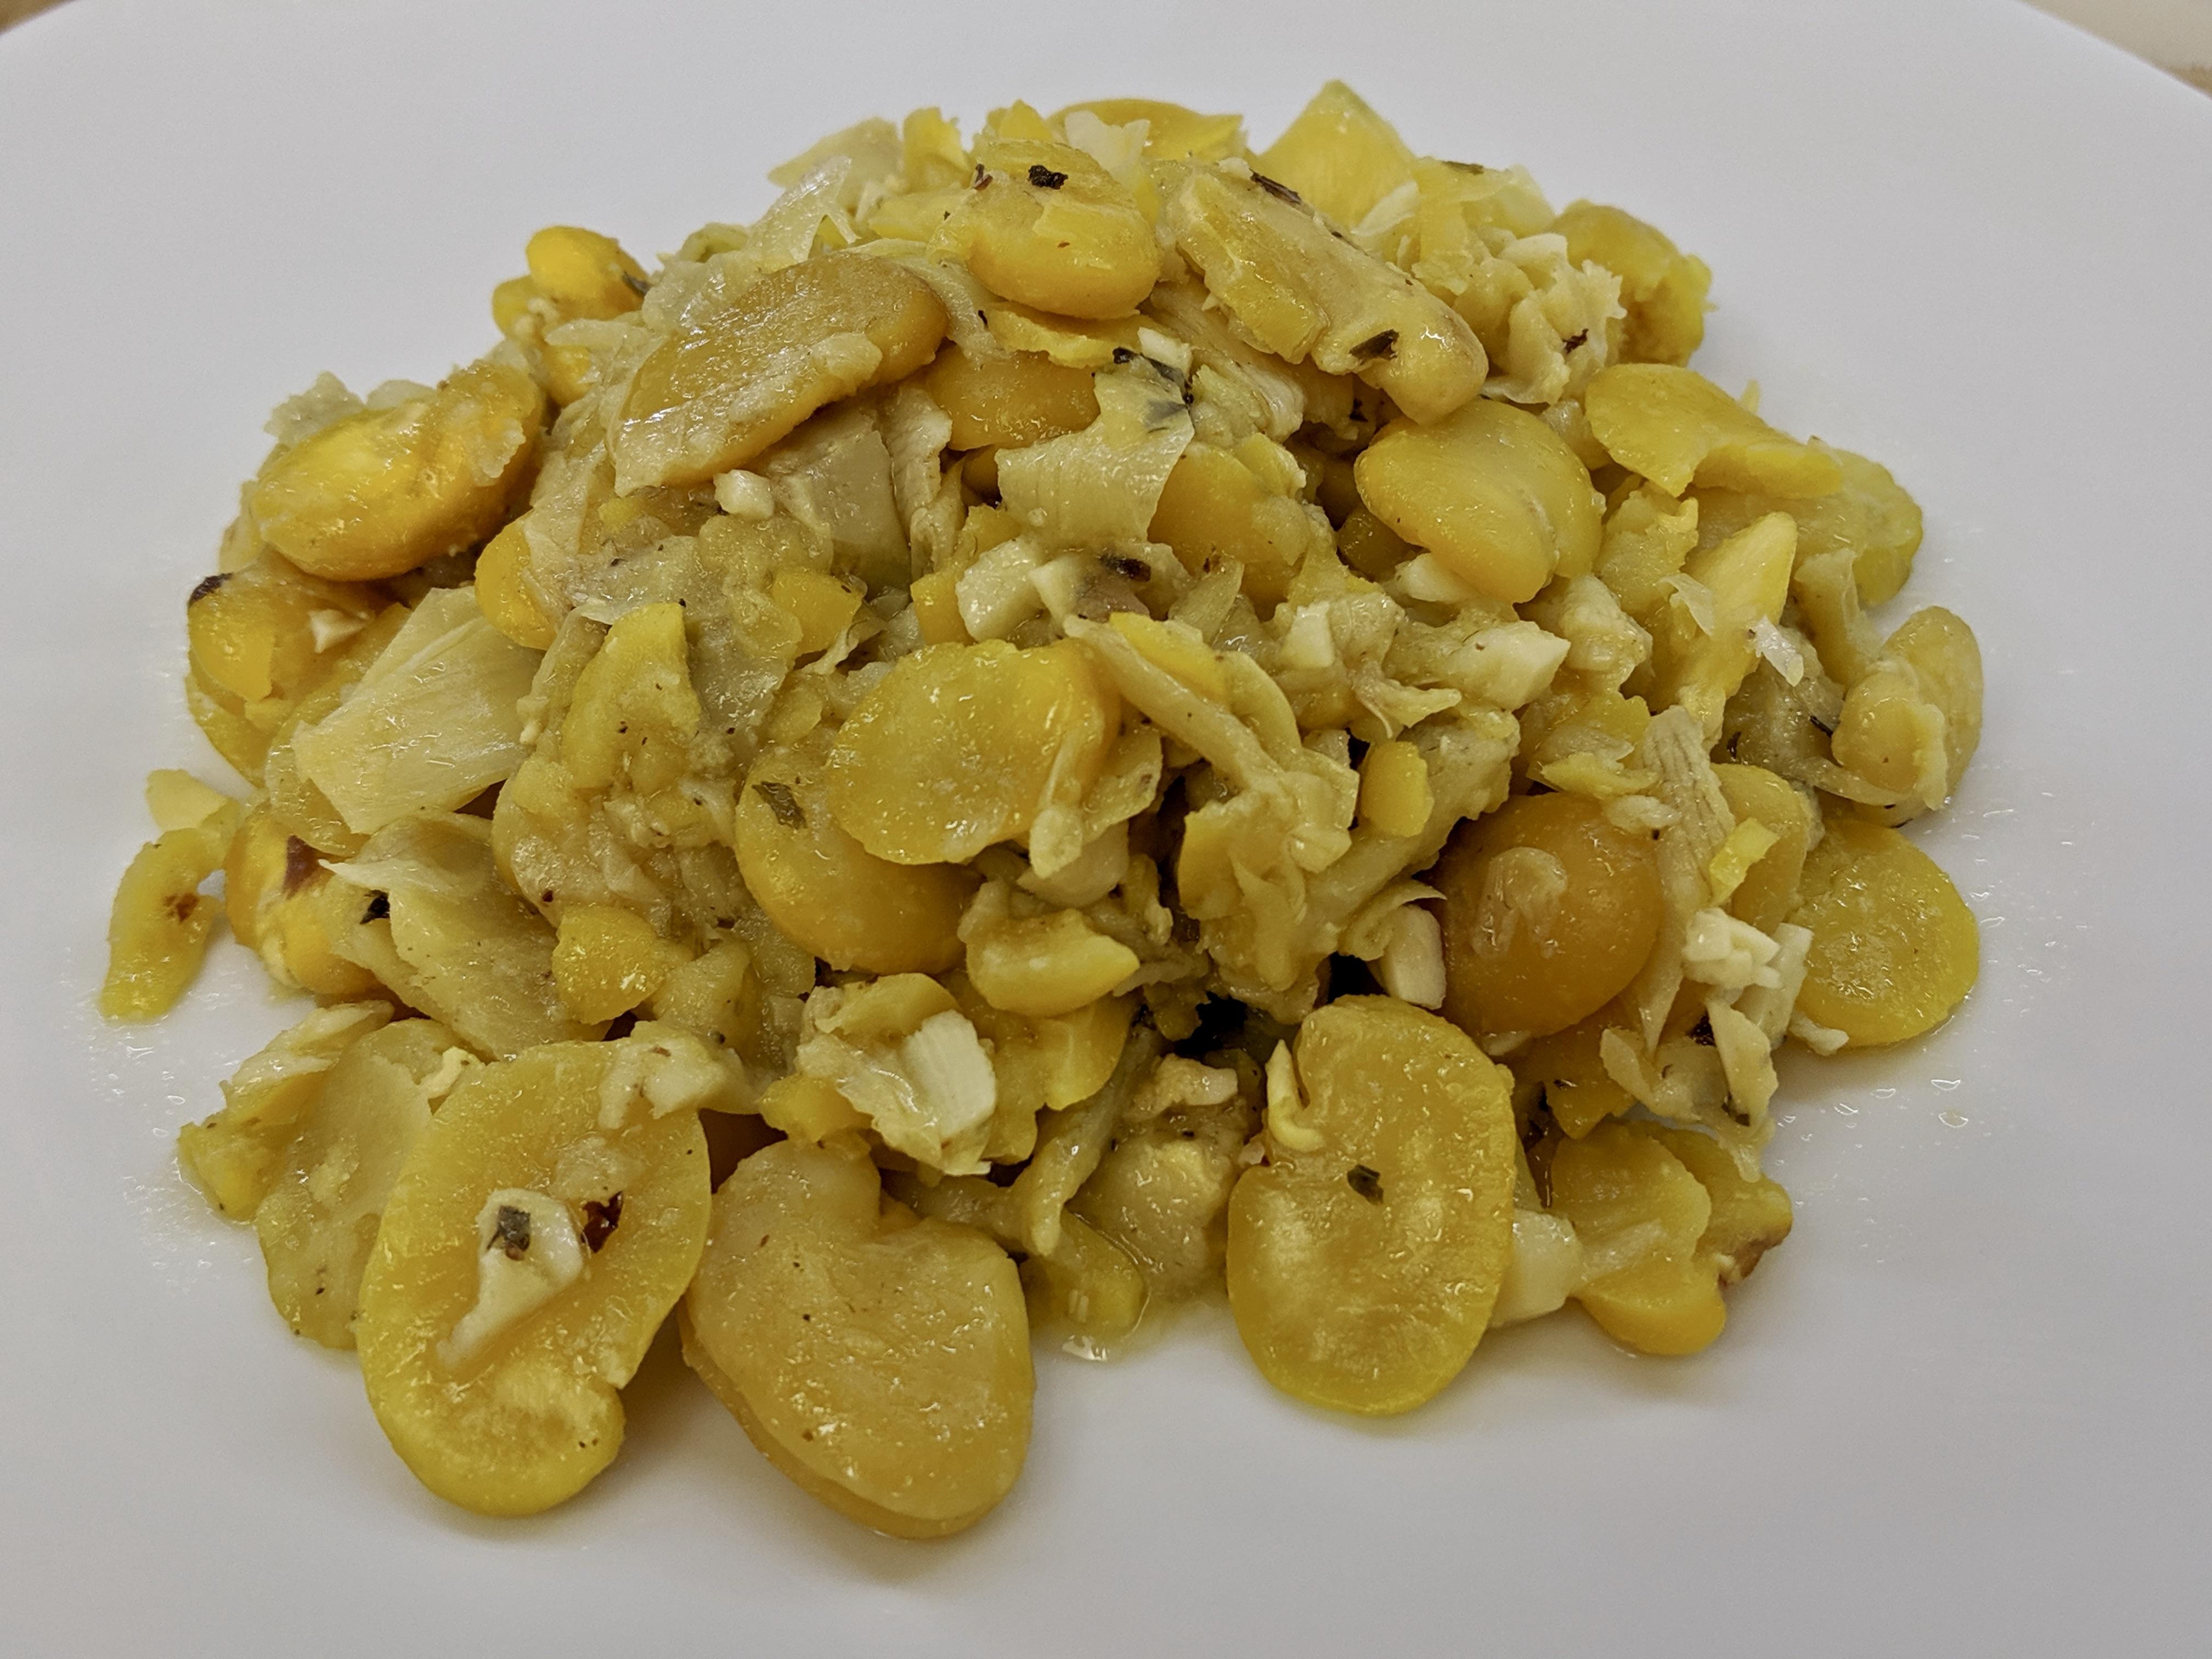 Meal 67 - Artichoke and Fava Bean Hearts